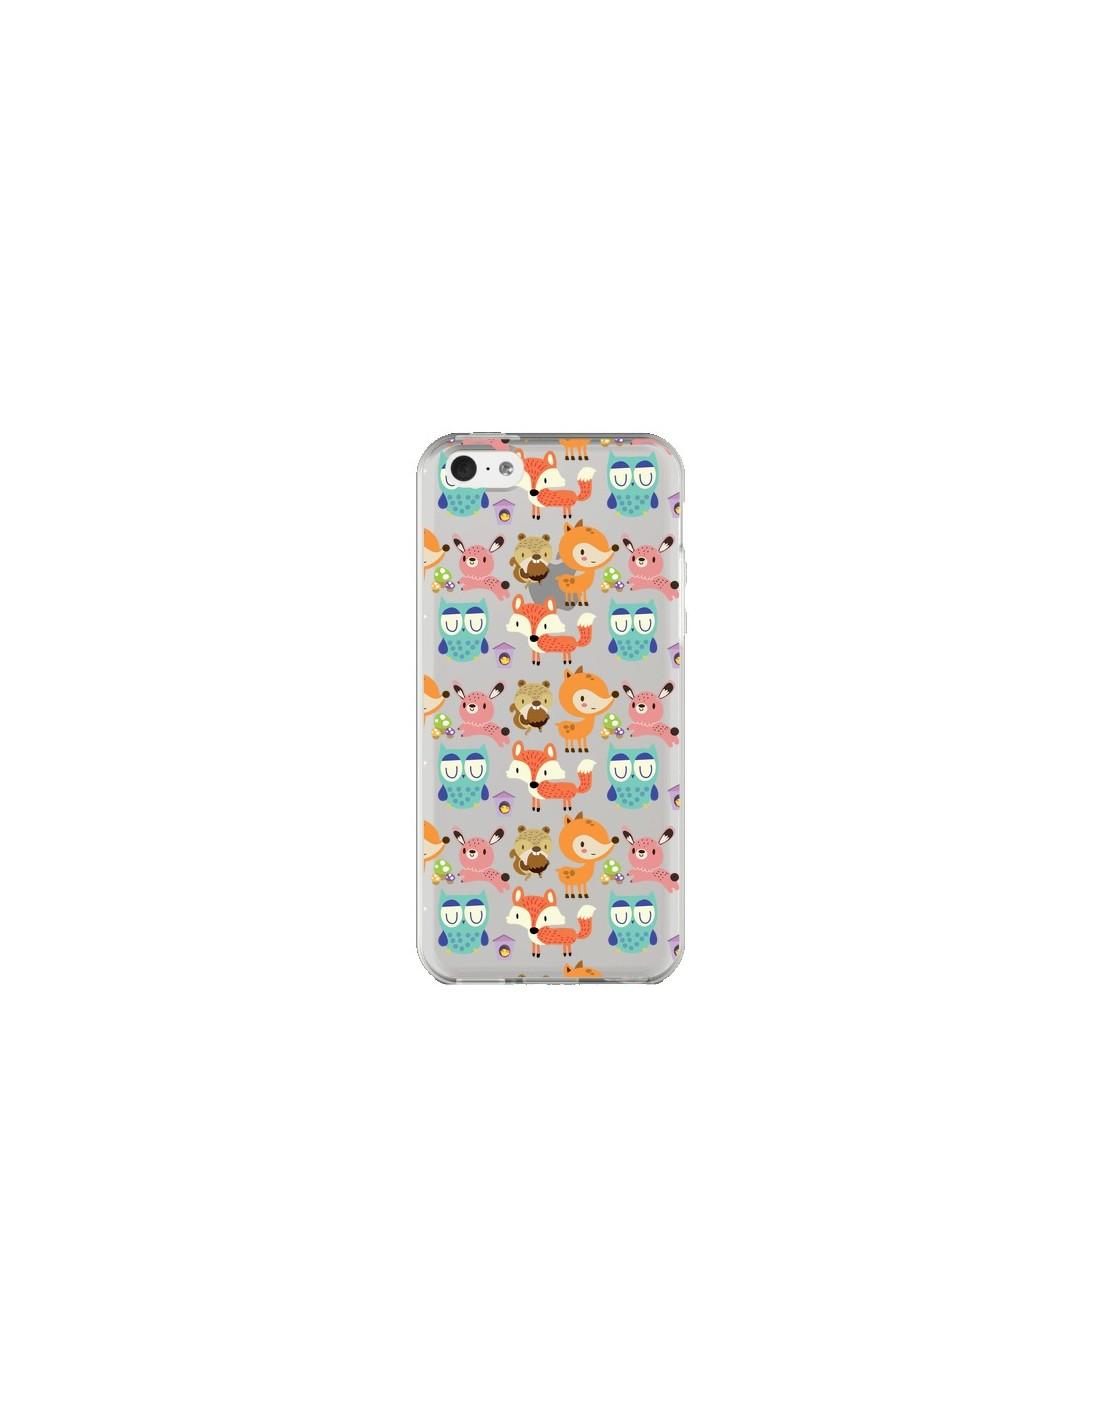 coque iphone 5c renard ecureuil lapin hibou transparente maria jose da luz